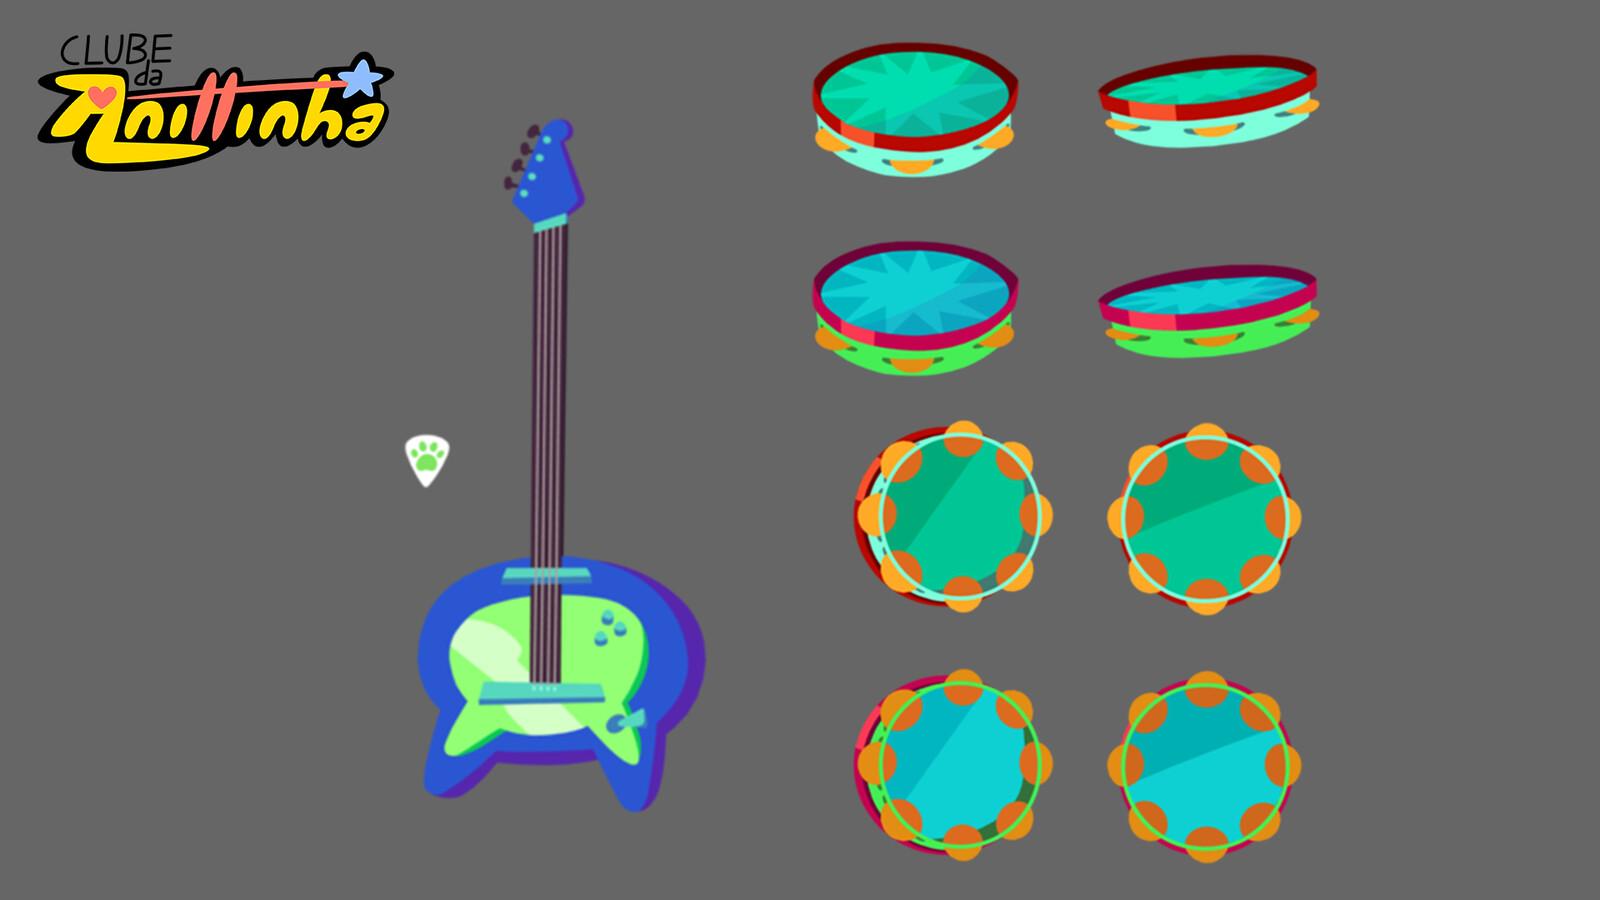 Prop Design - Guitar and Tambourine